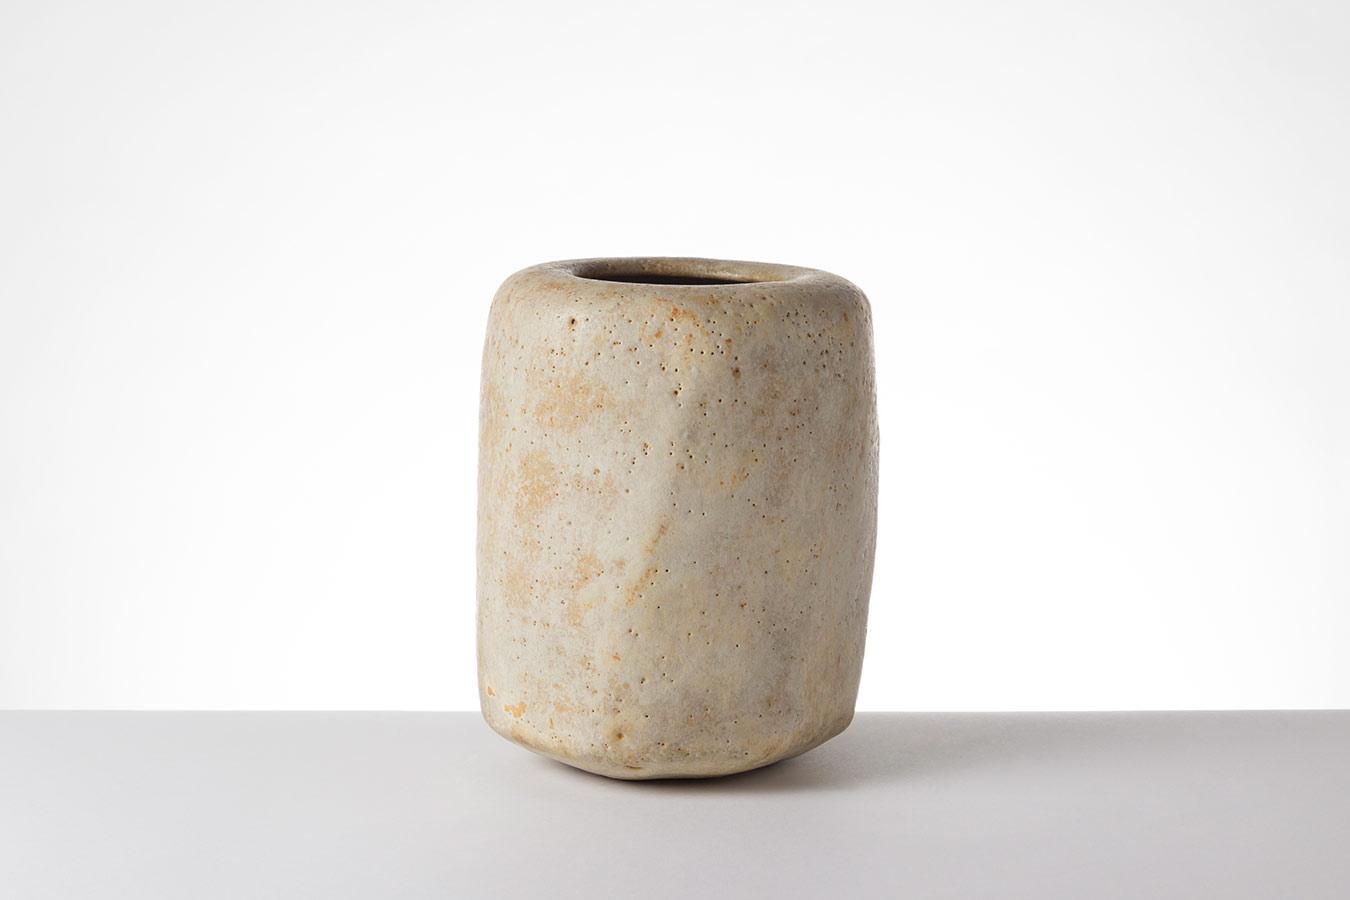 cerámica de Lucie Rie